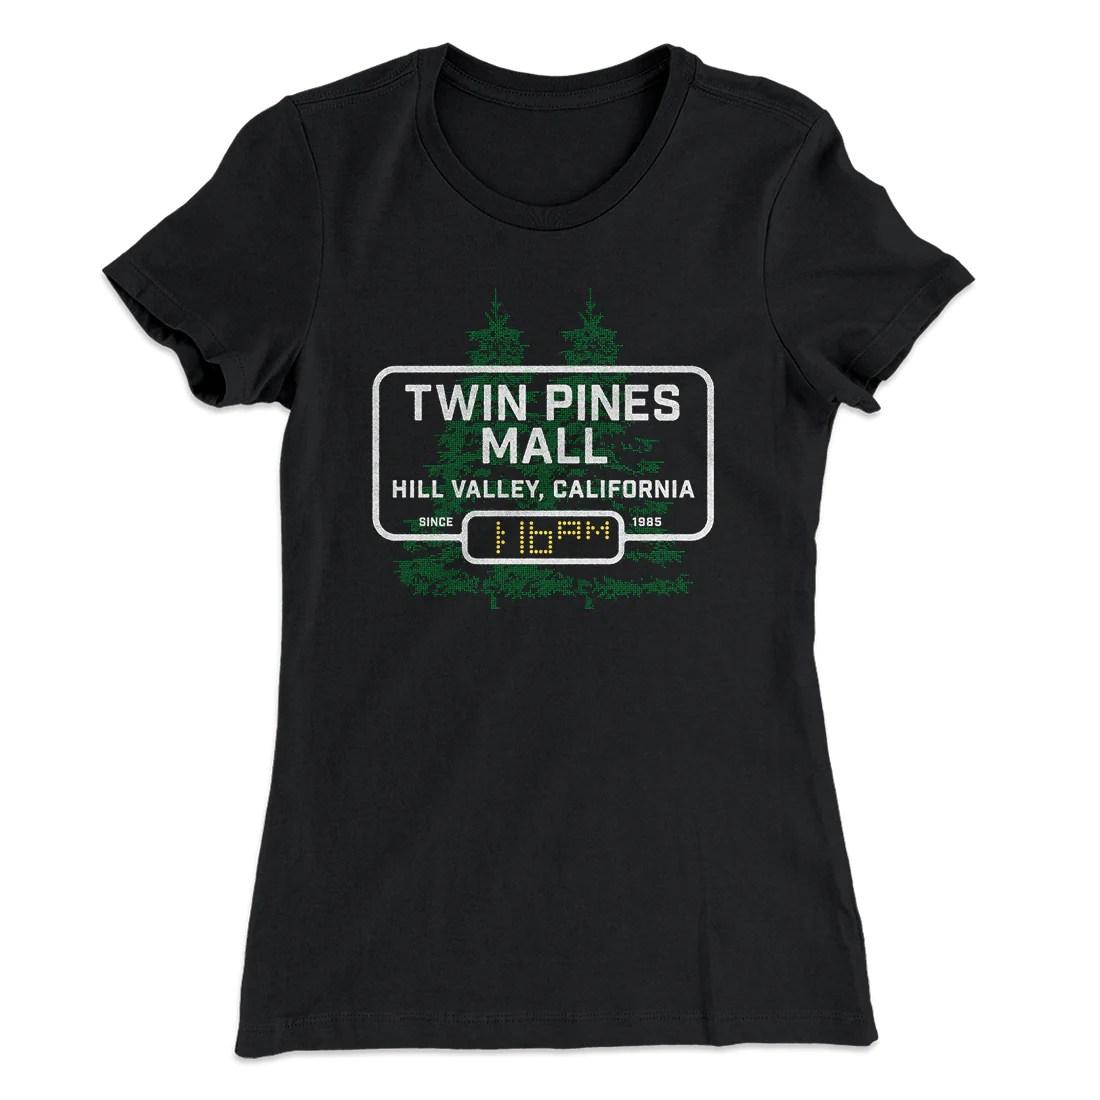 twin pines mall women